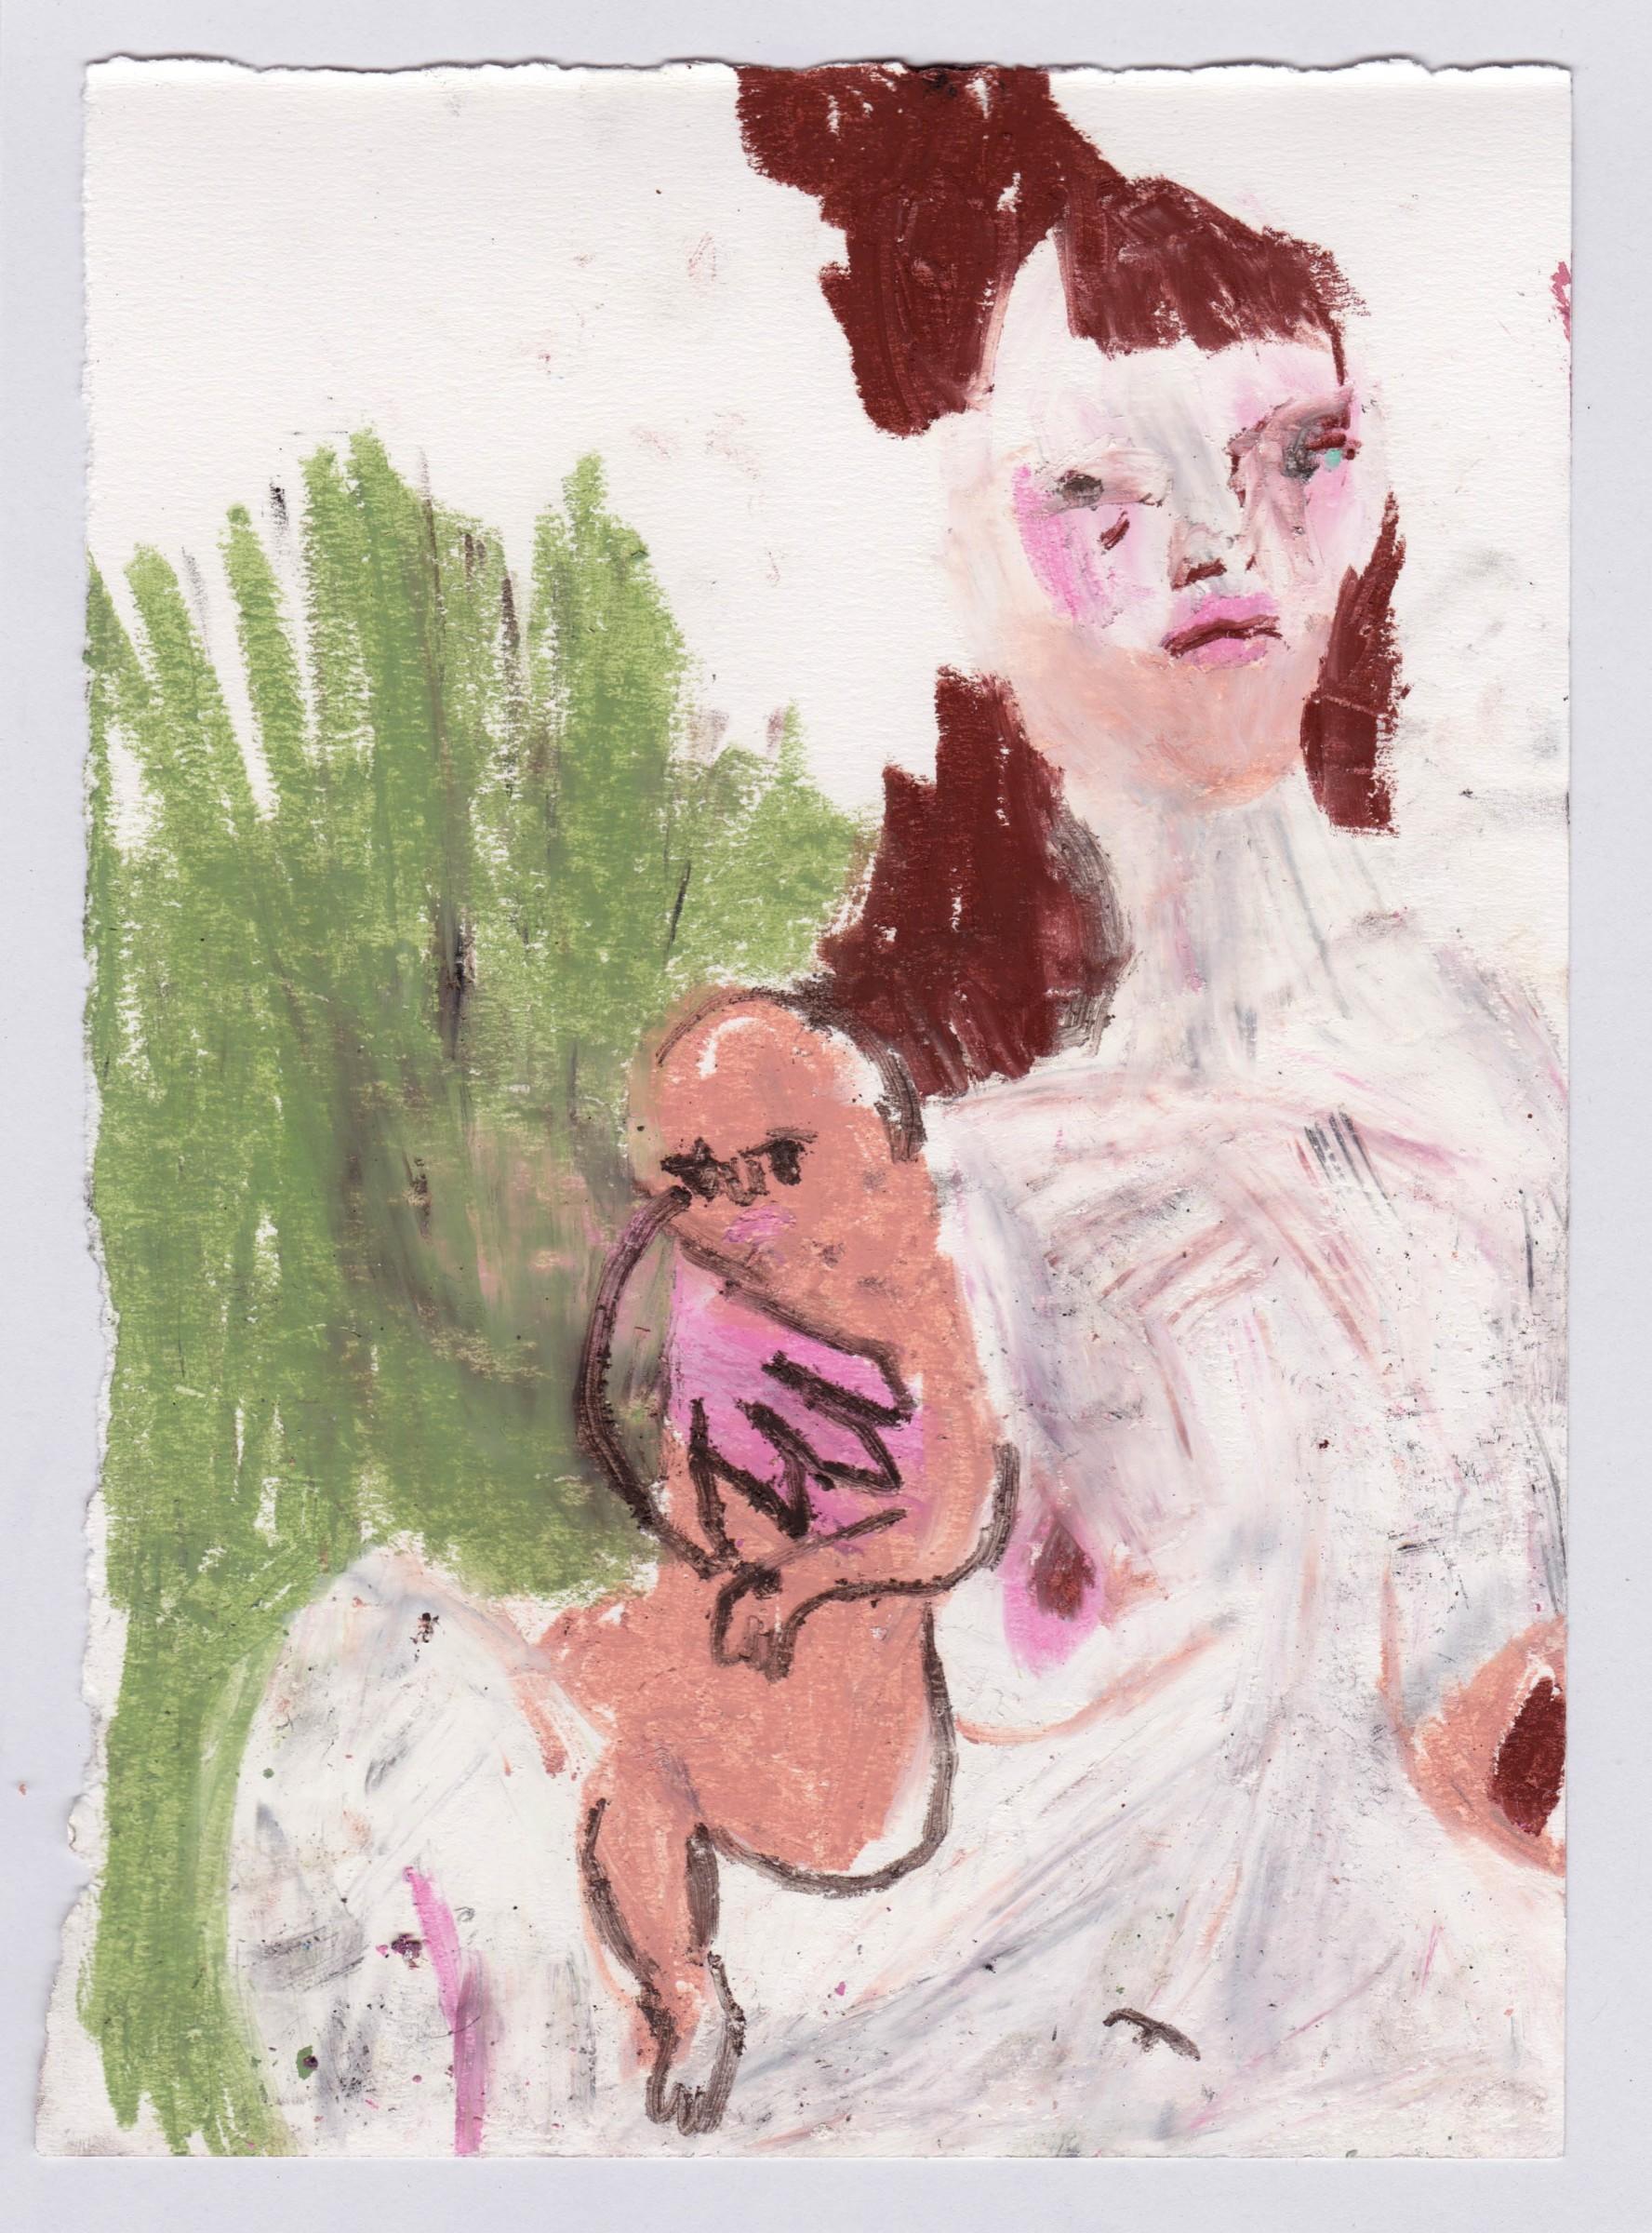 "<span class=""link fancybox-details-link""><a href=""/exhibitions/39/works/artworks_standalone12359/"">View Detail Page</a></span><div class=""medium"">oil pastel</div><div class=""dimensions"">Artwork: 25.5 x 18cm</div>"